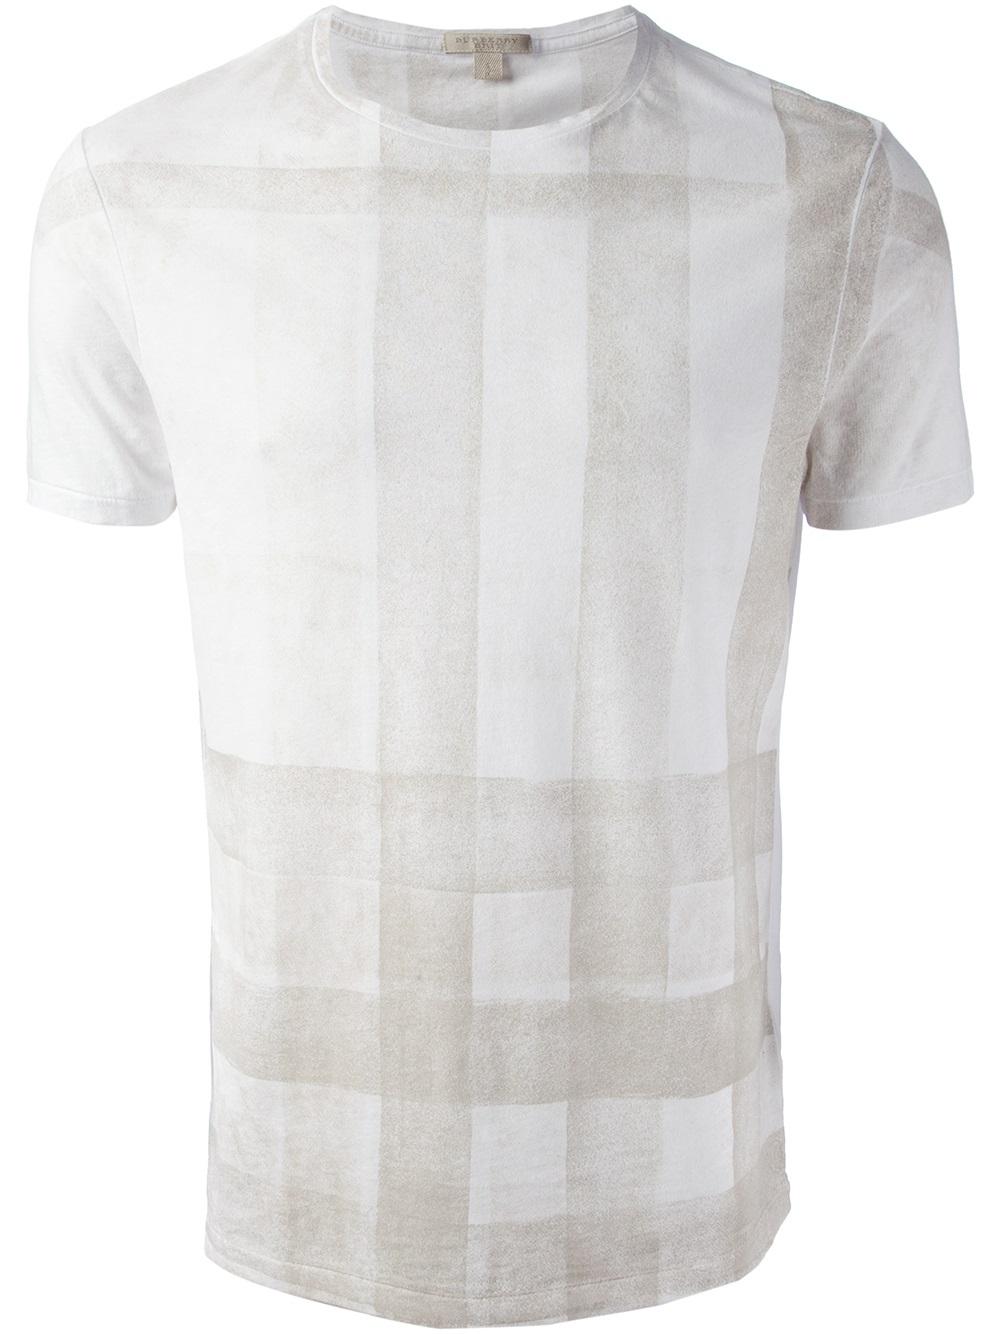 lyst burberry brit nova check tshirt in white for men. Black Bedroom Furniture Sets. Home Design Ideas